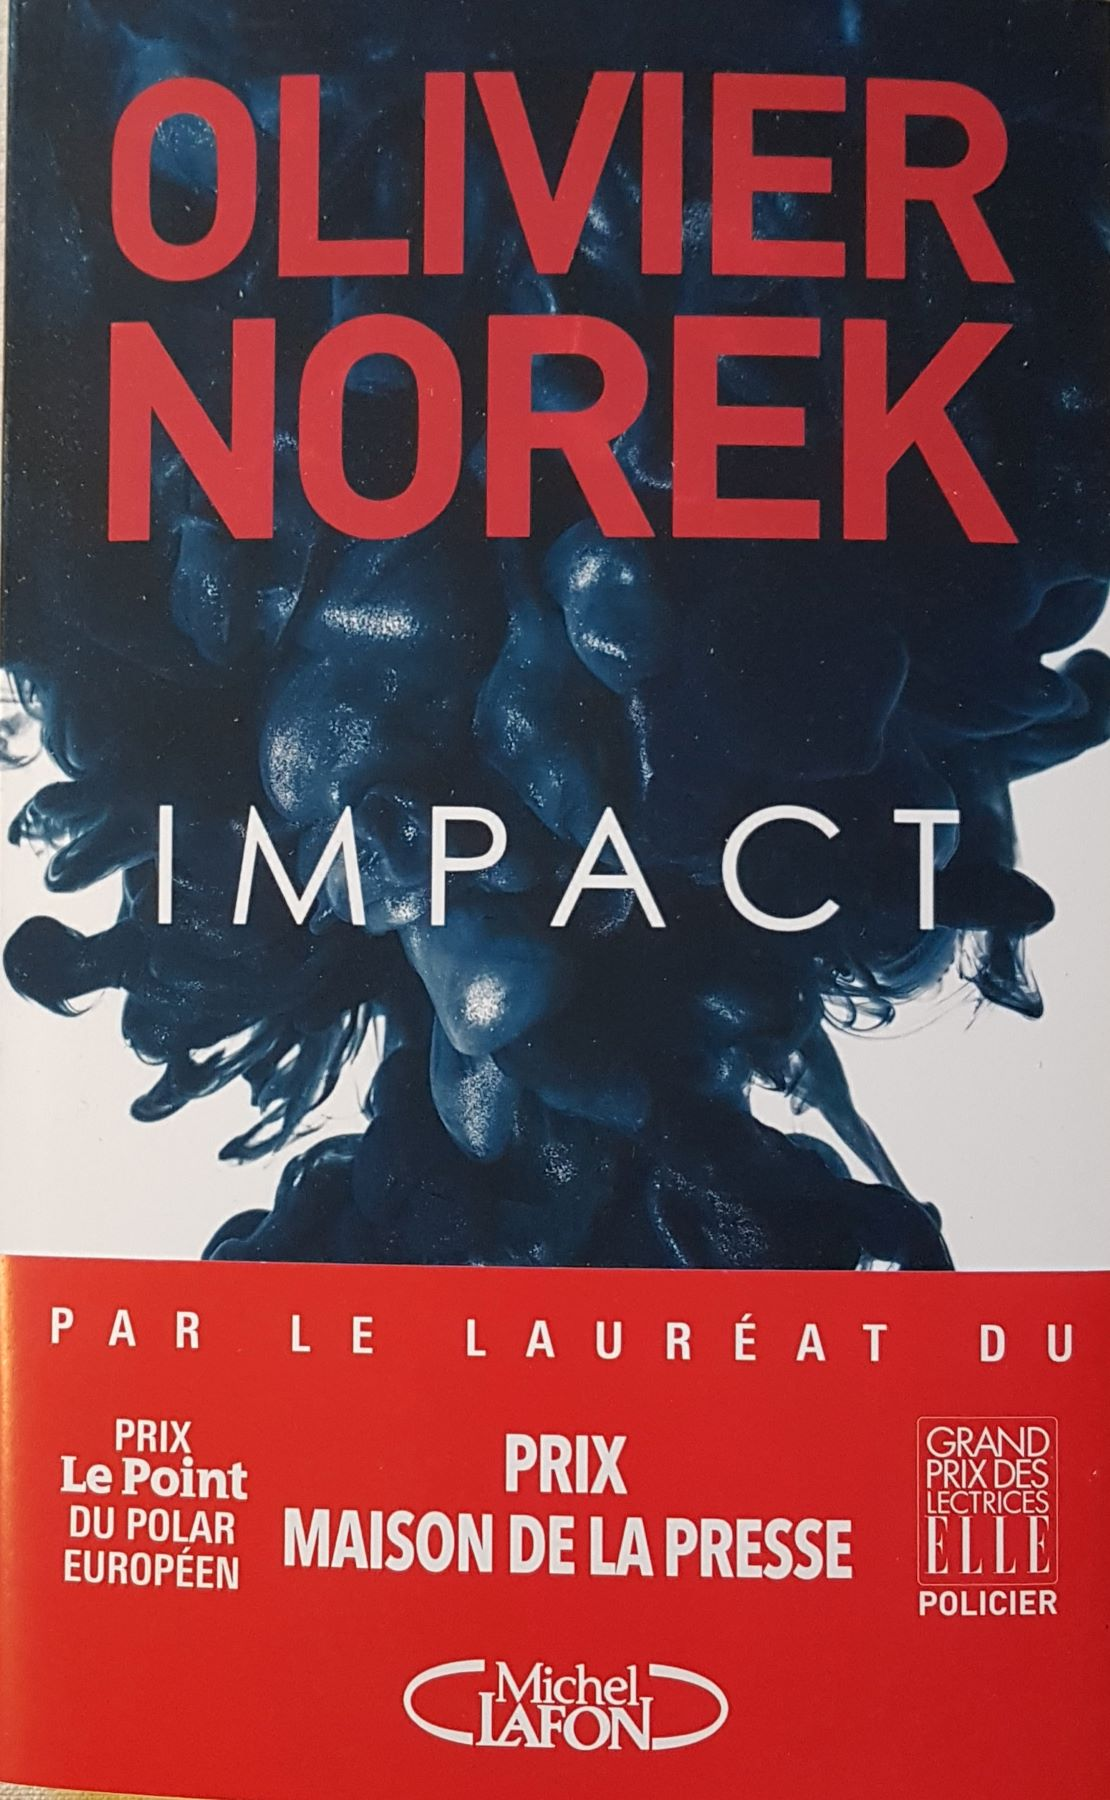 Librairie La librai'bulles Impact